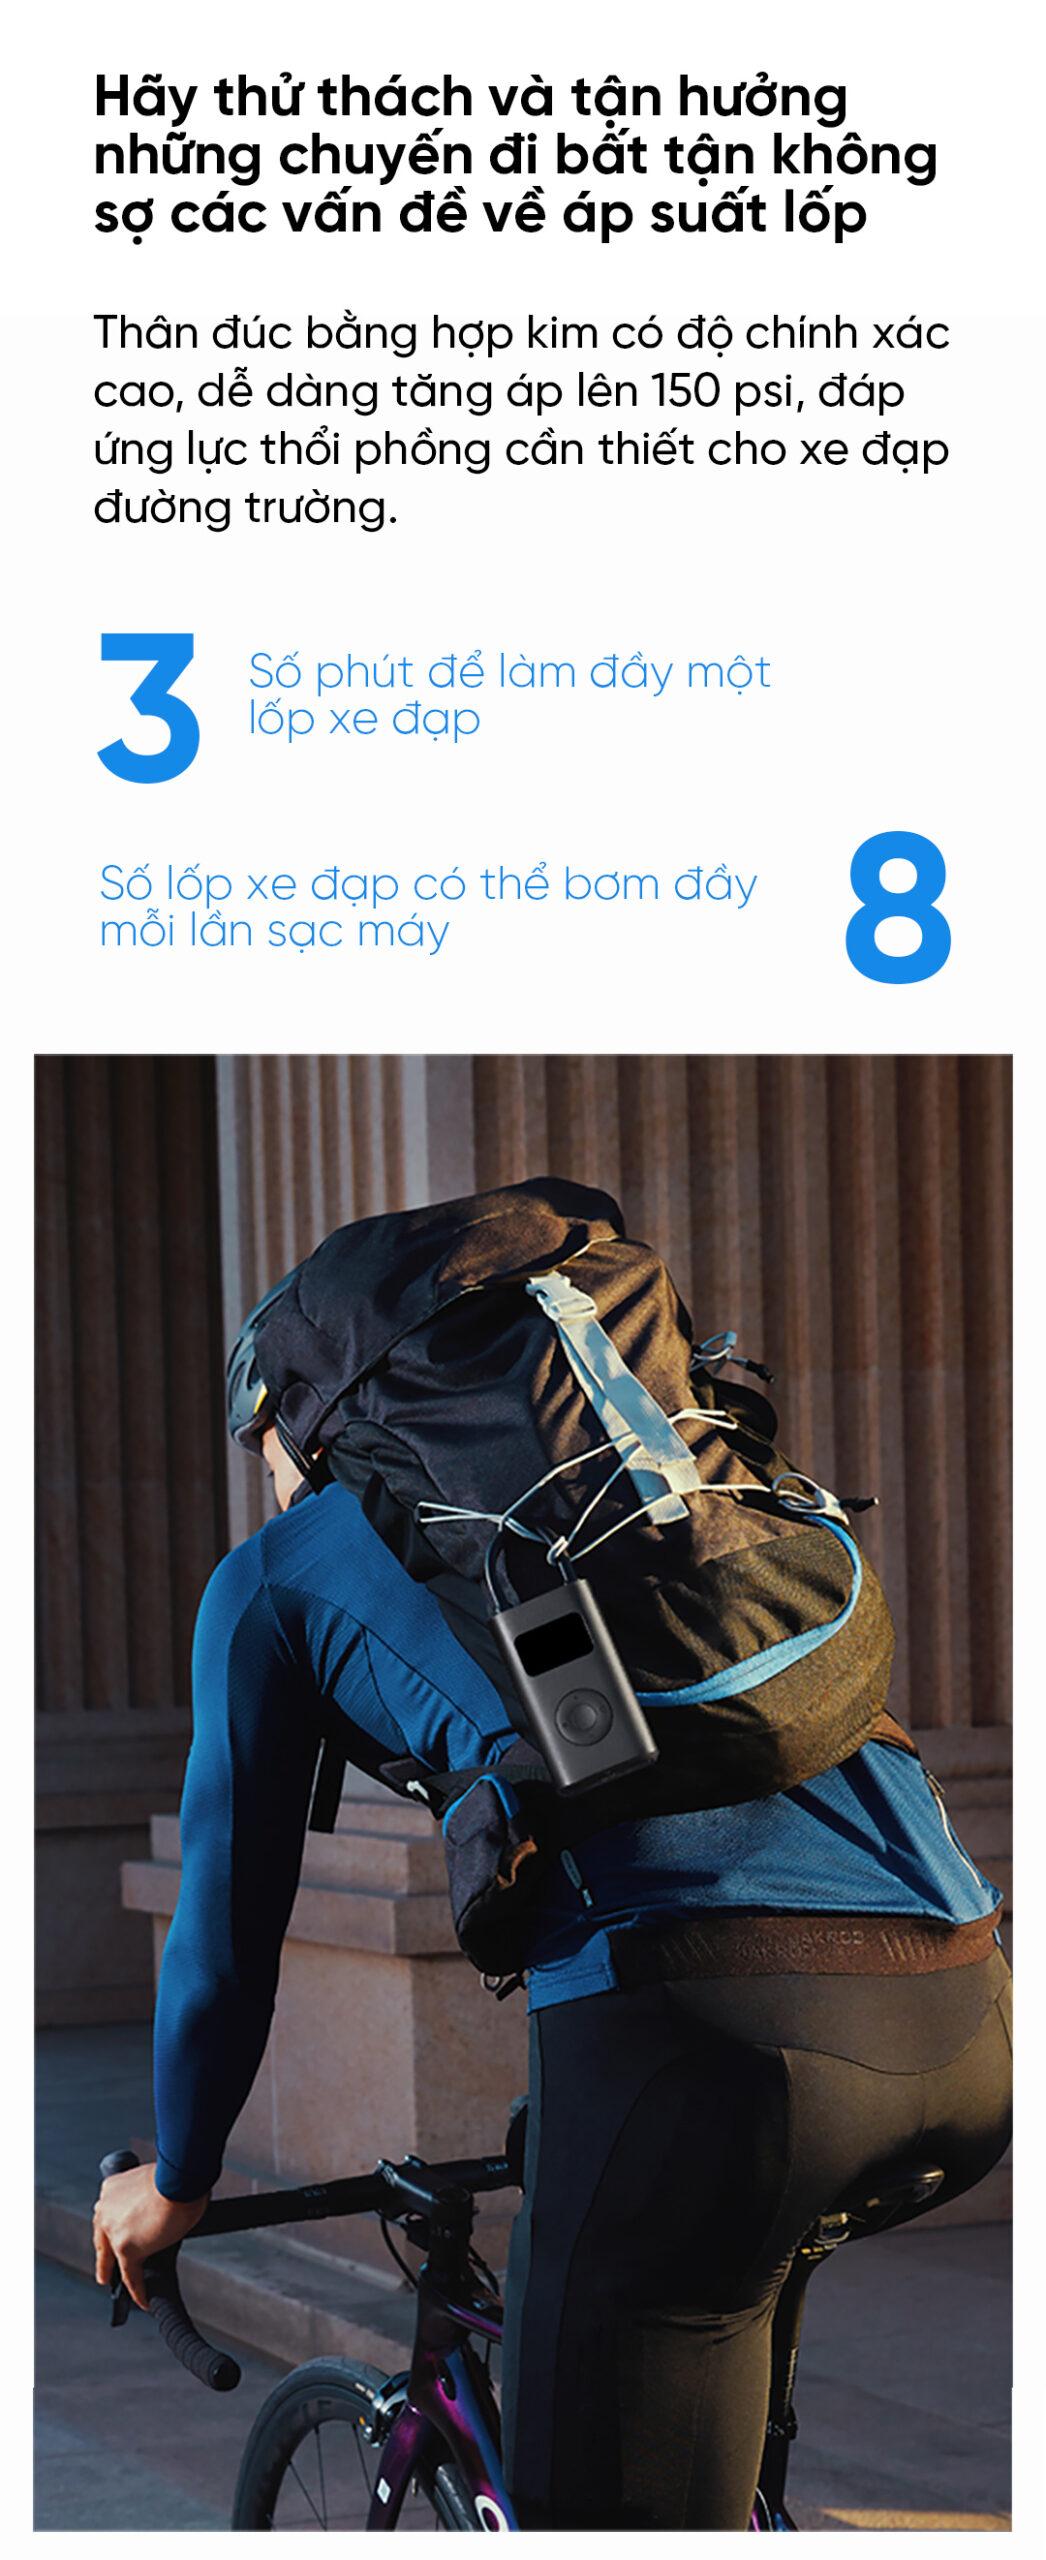 Máy bơm lốp cầm tay tự động Xiaomi Mijia MJCQ01QJ (3)